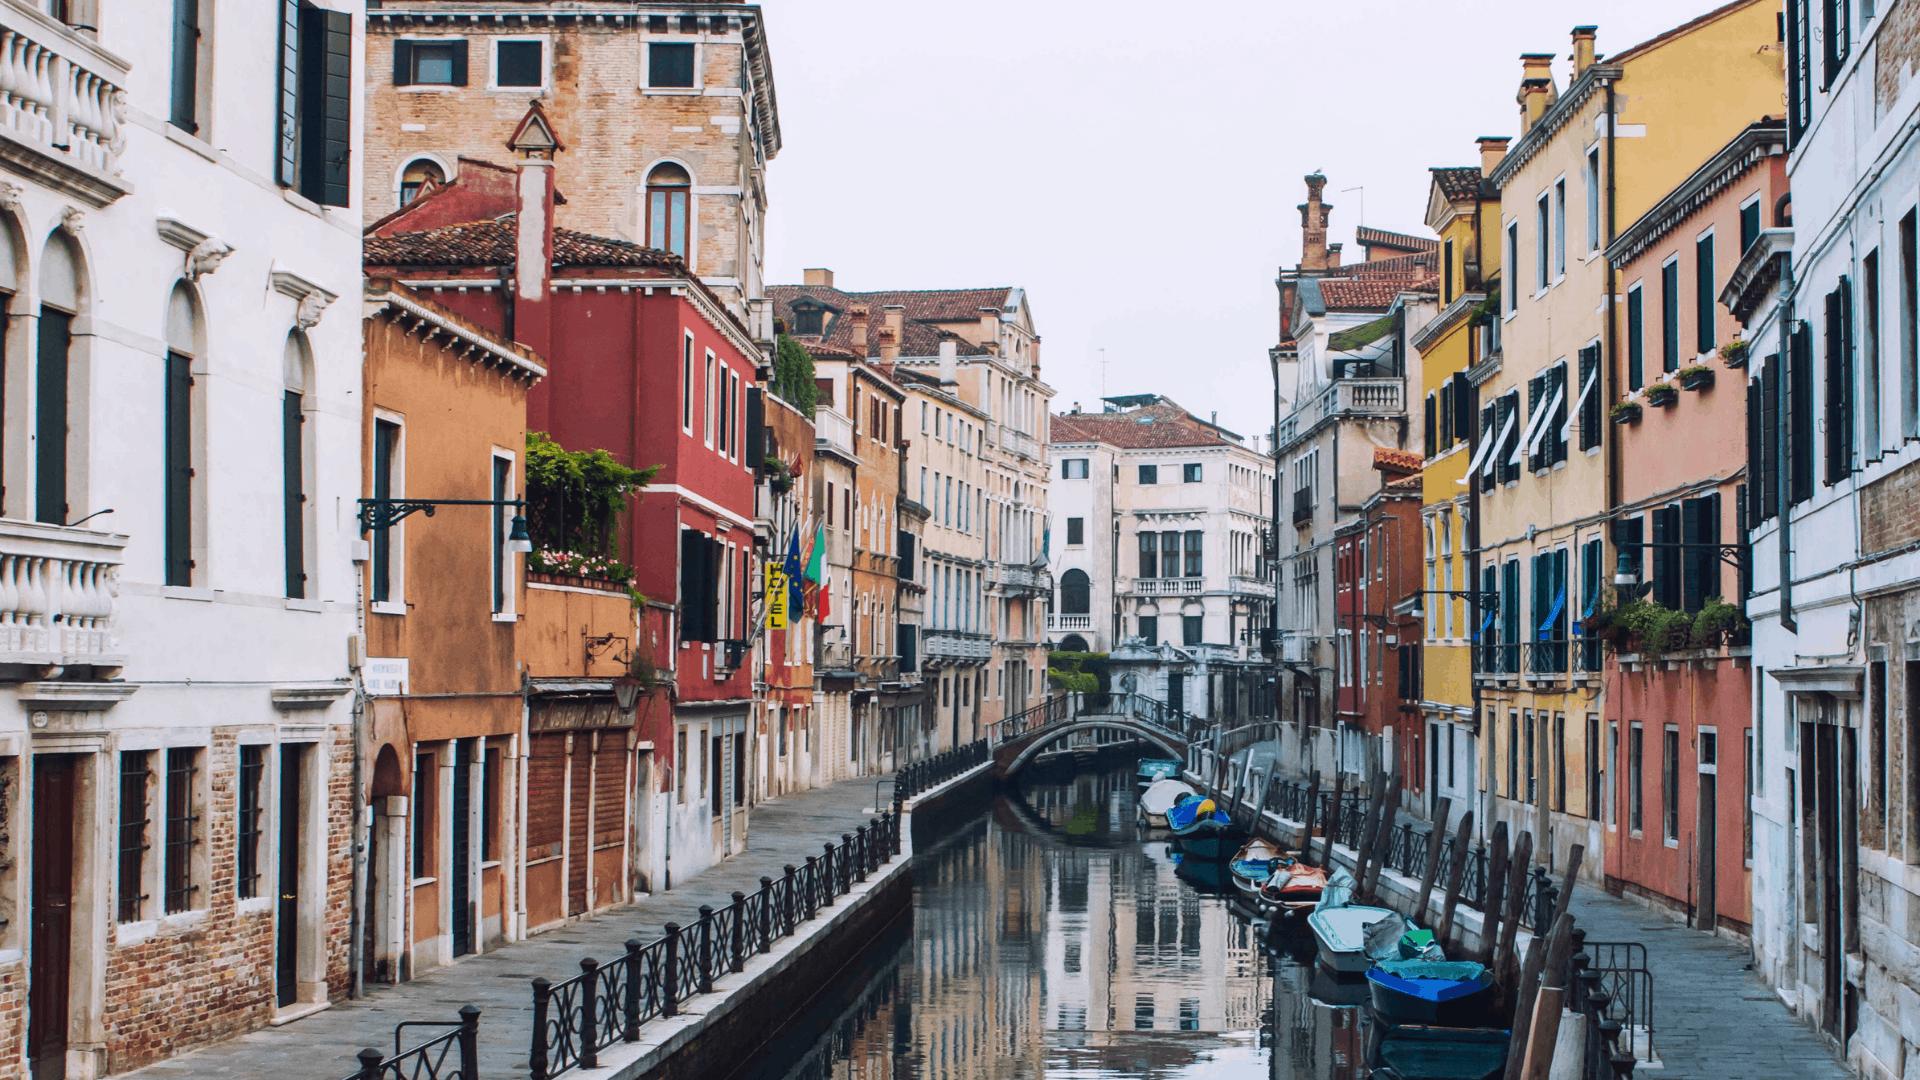 Visit these amazing Italian Cities. Each beautiful and very different. #italy #italiancities #italianitinerary